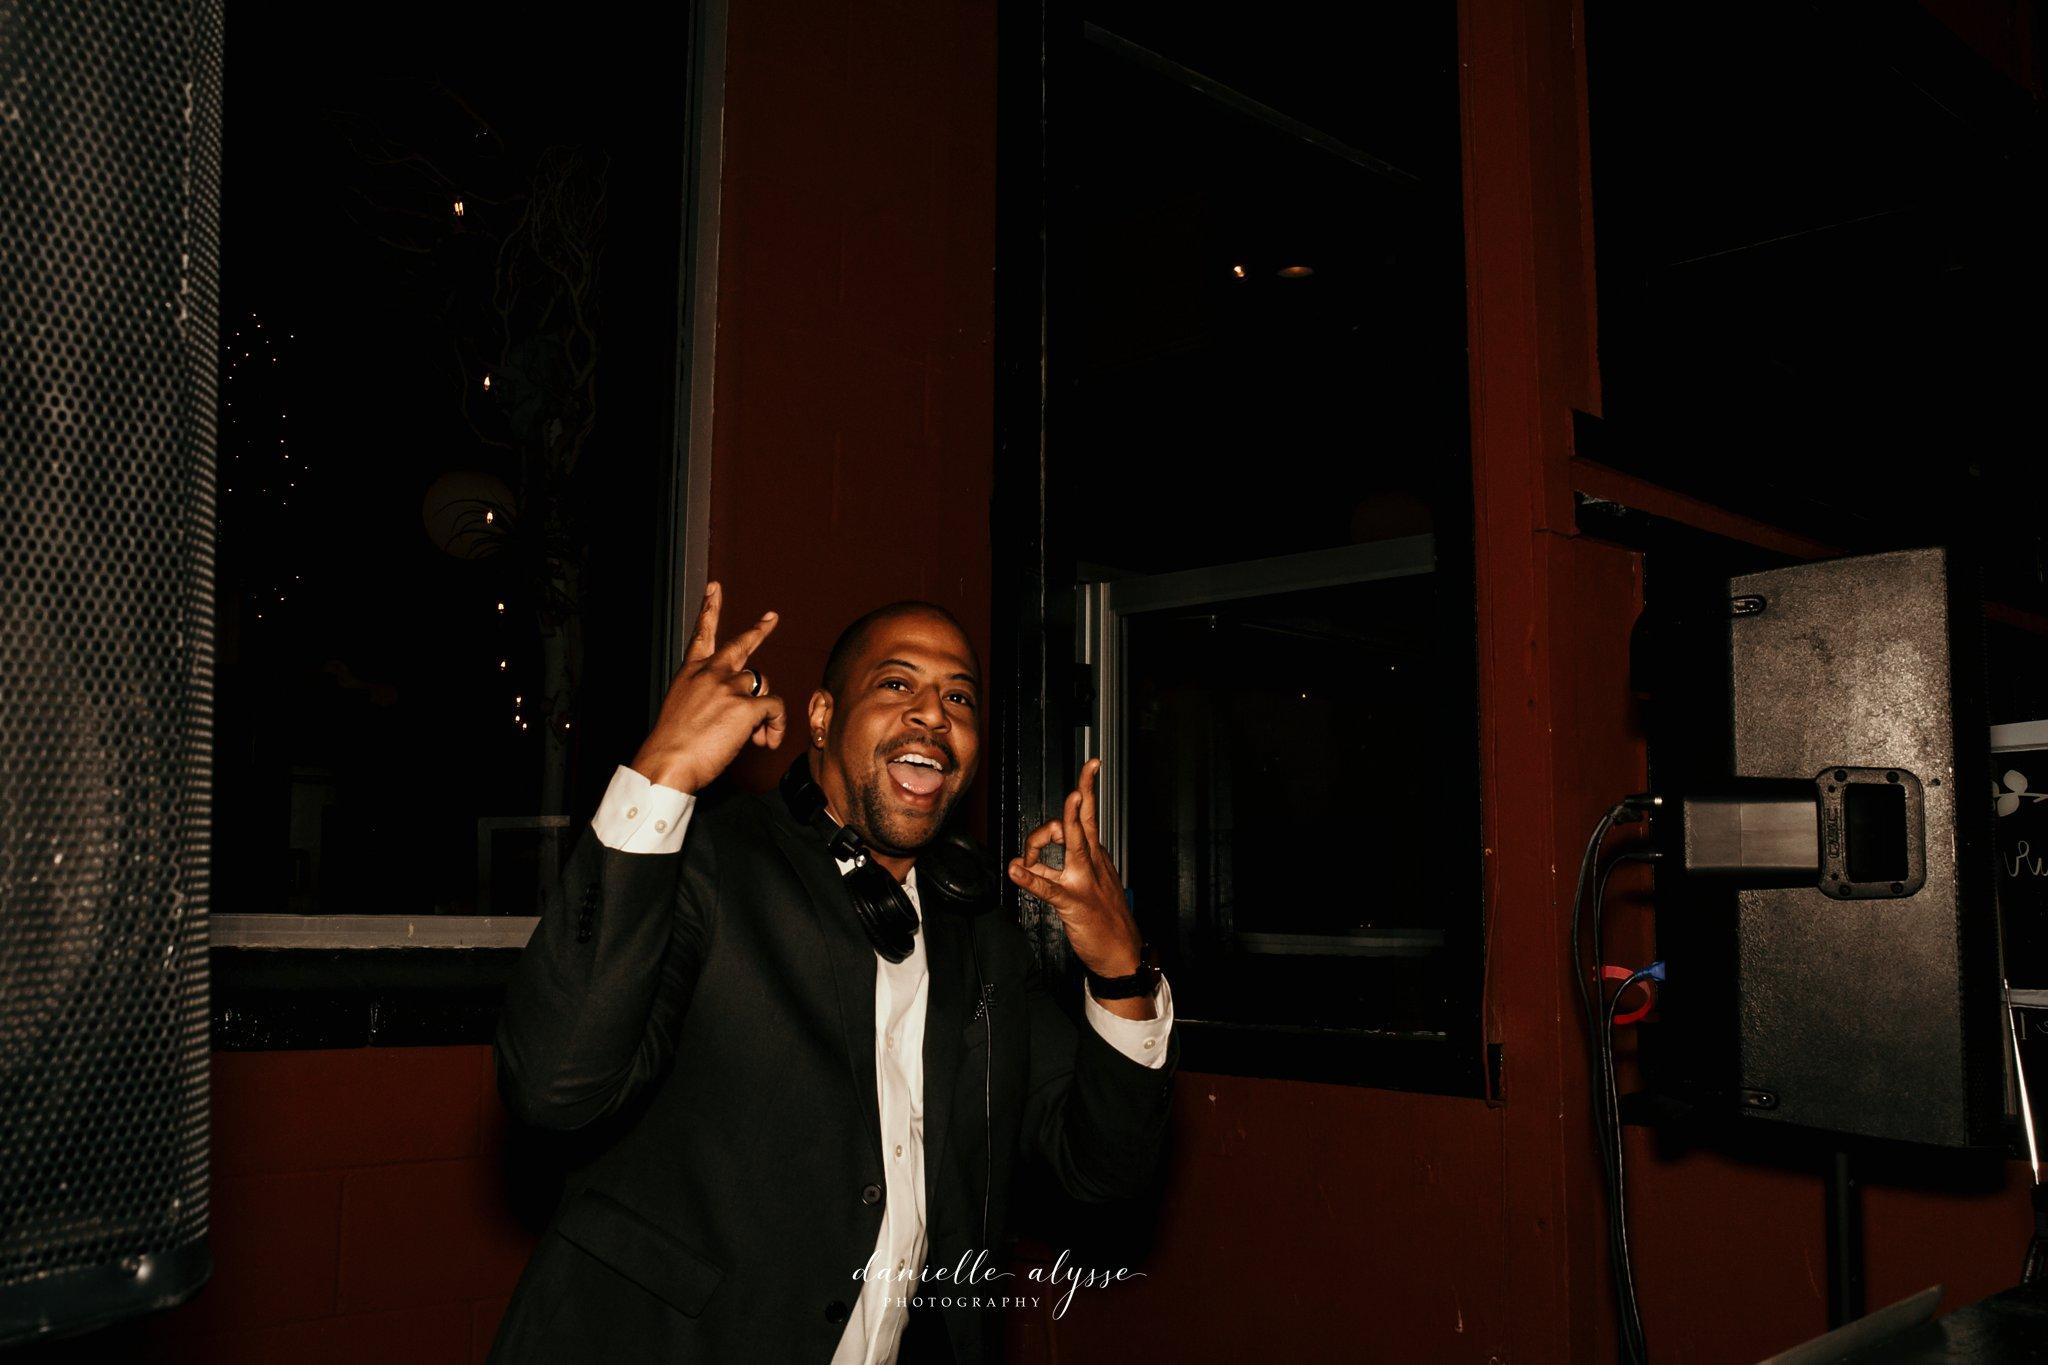 180831_wedding_stephanie_heavenly_south_lake_tahoe_danielle_alysse_photography_destination_blog_1222_WEB.jpg